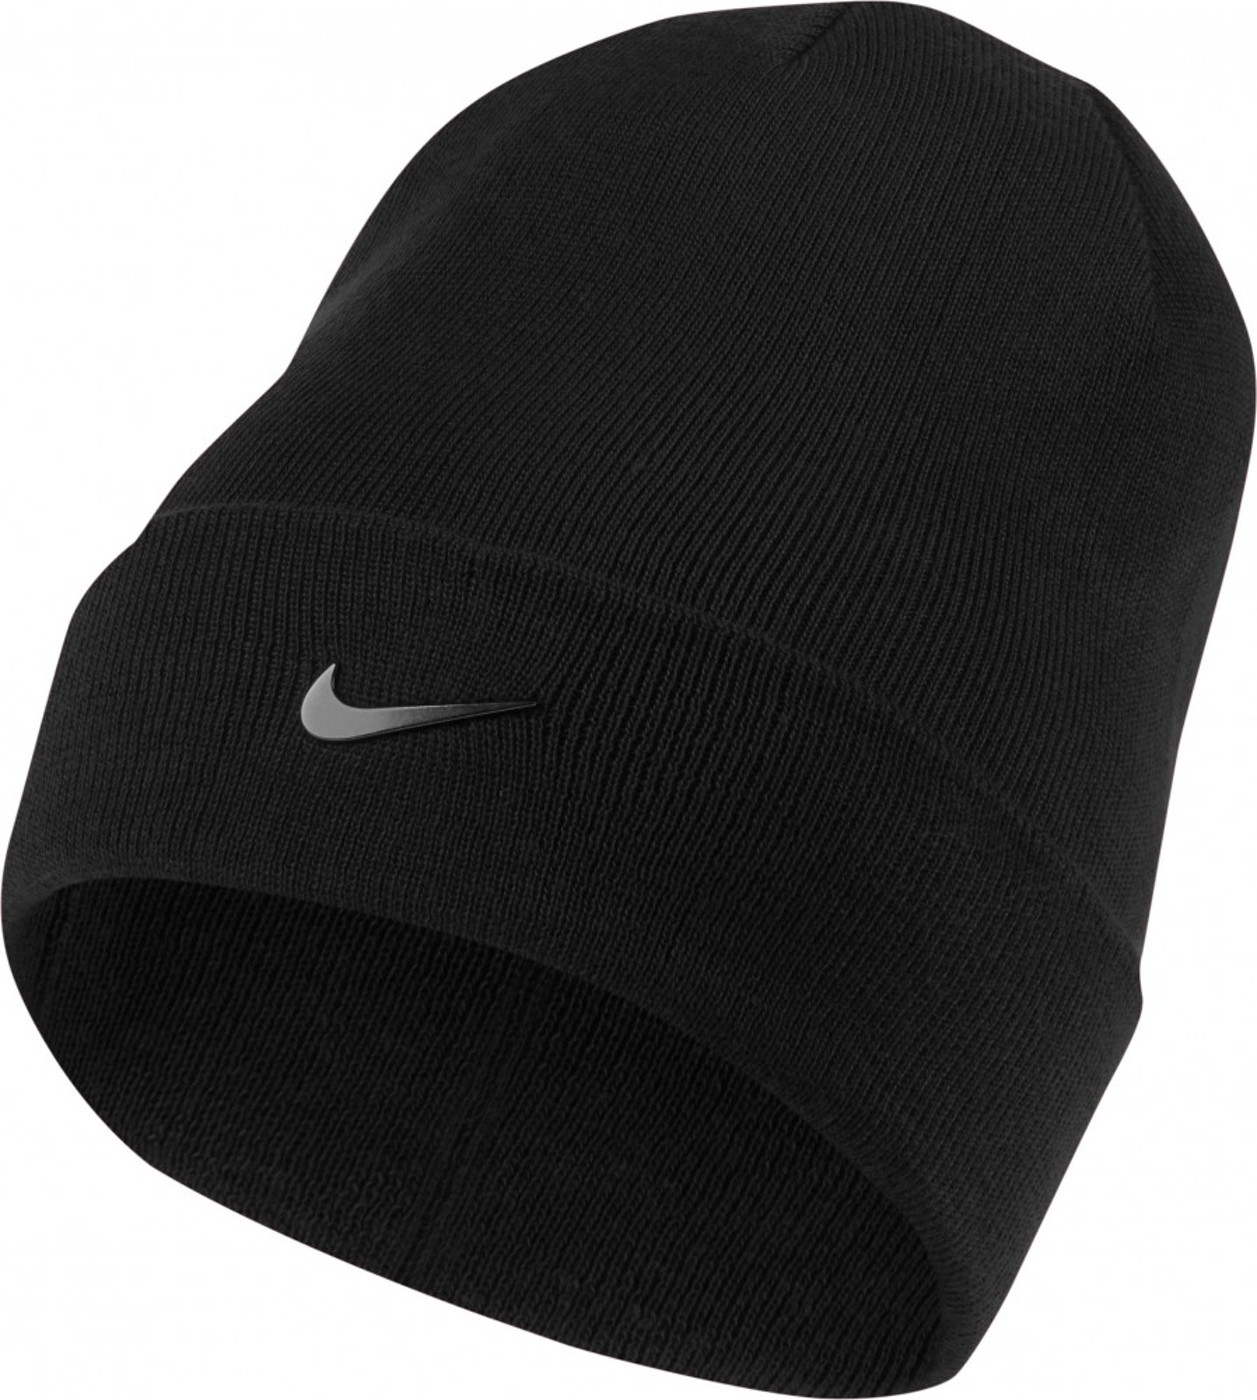 Nike Sportswear Beanie - Herren